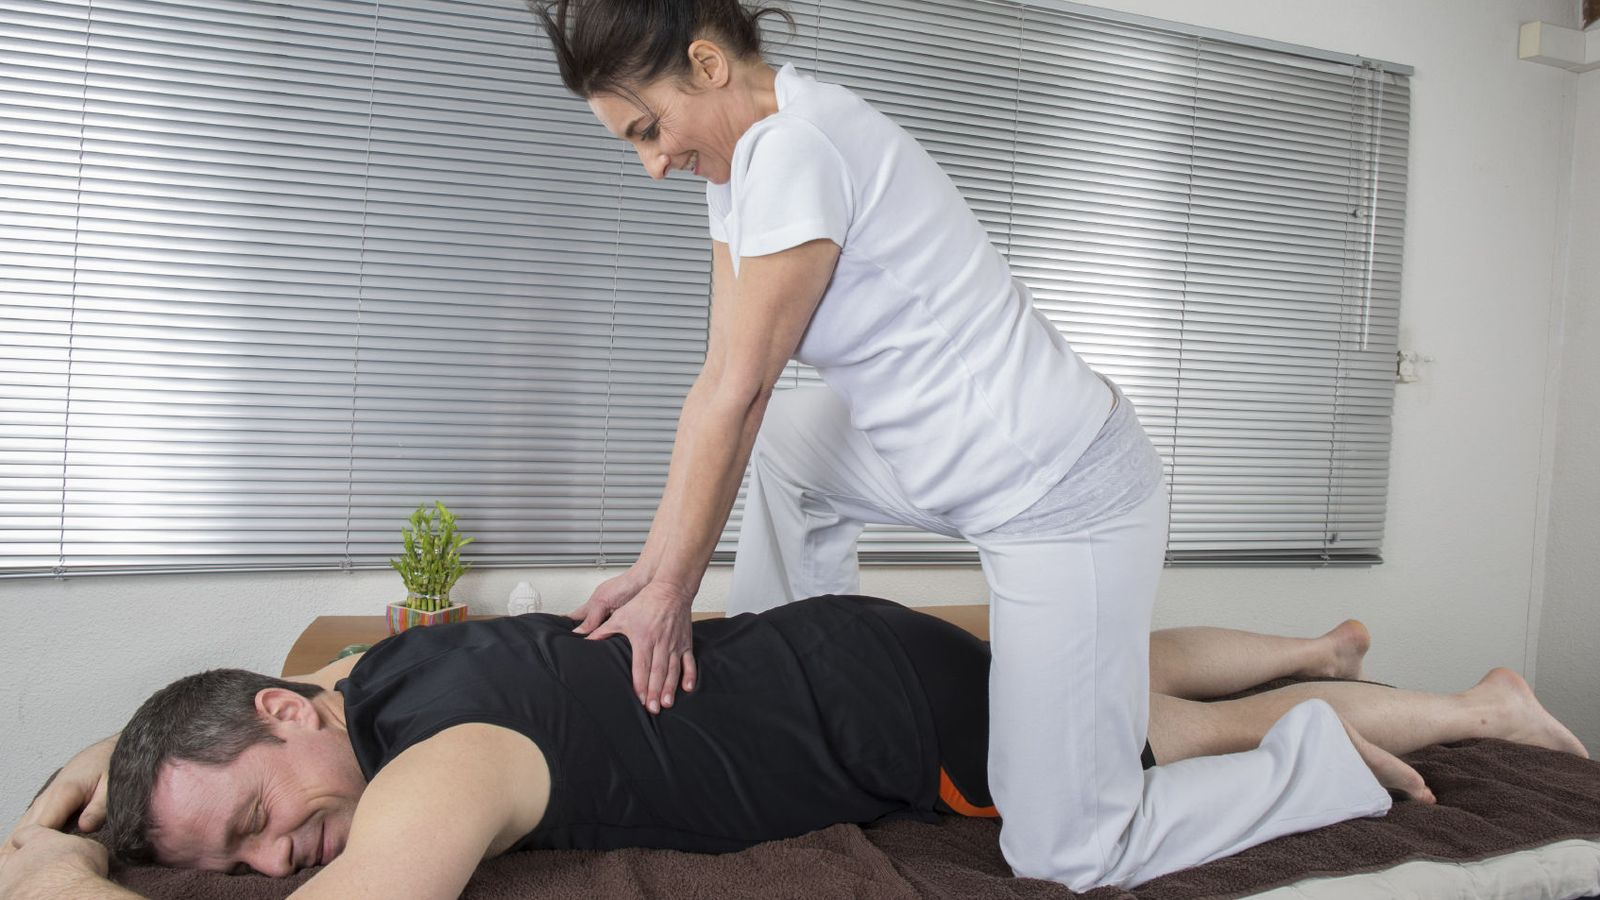 chicas masajes xxx porno de gisela